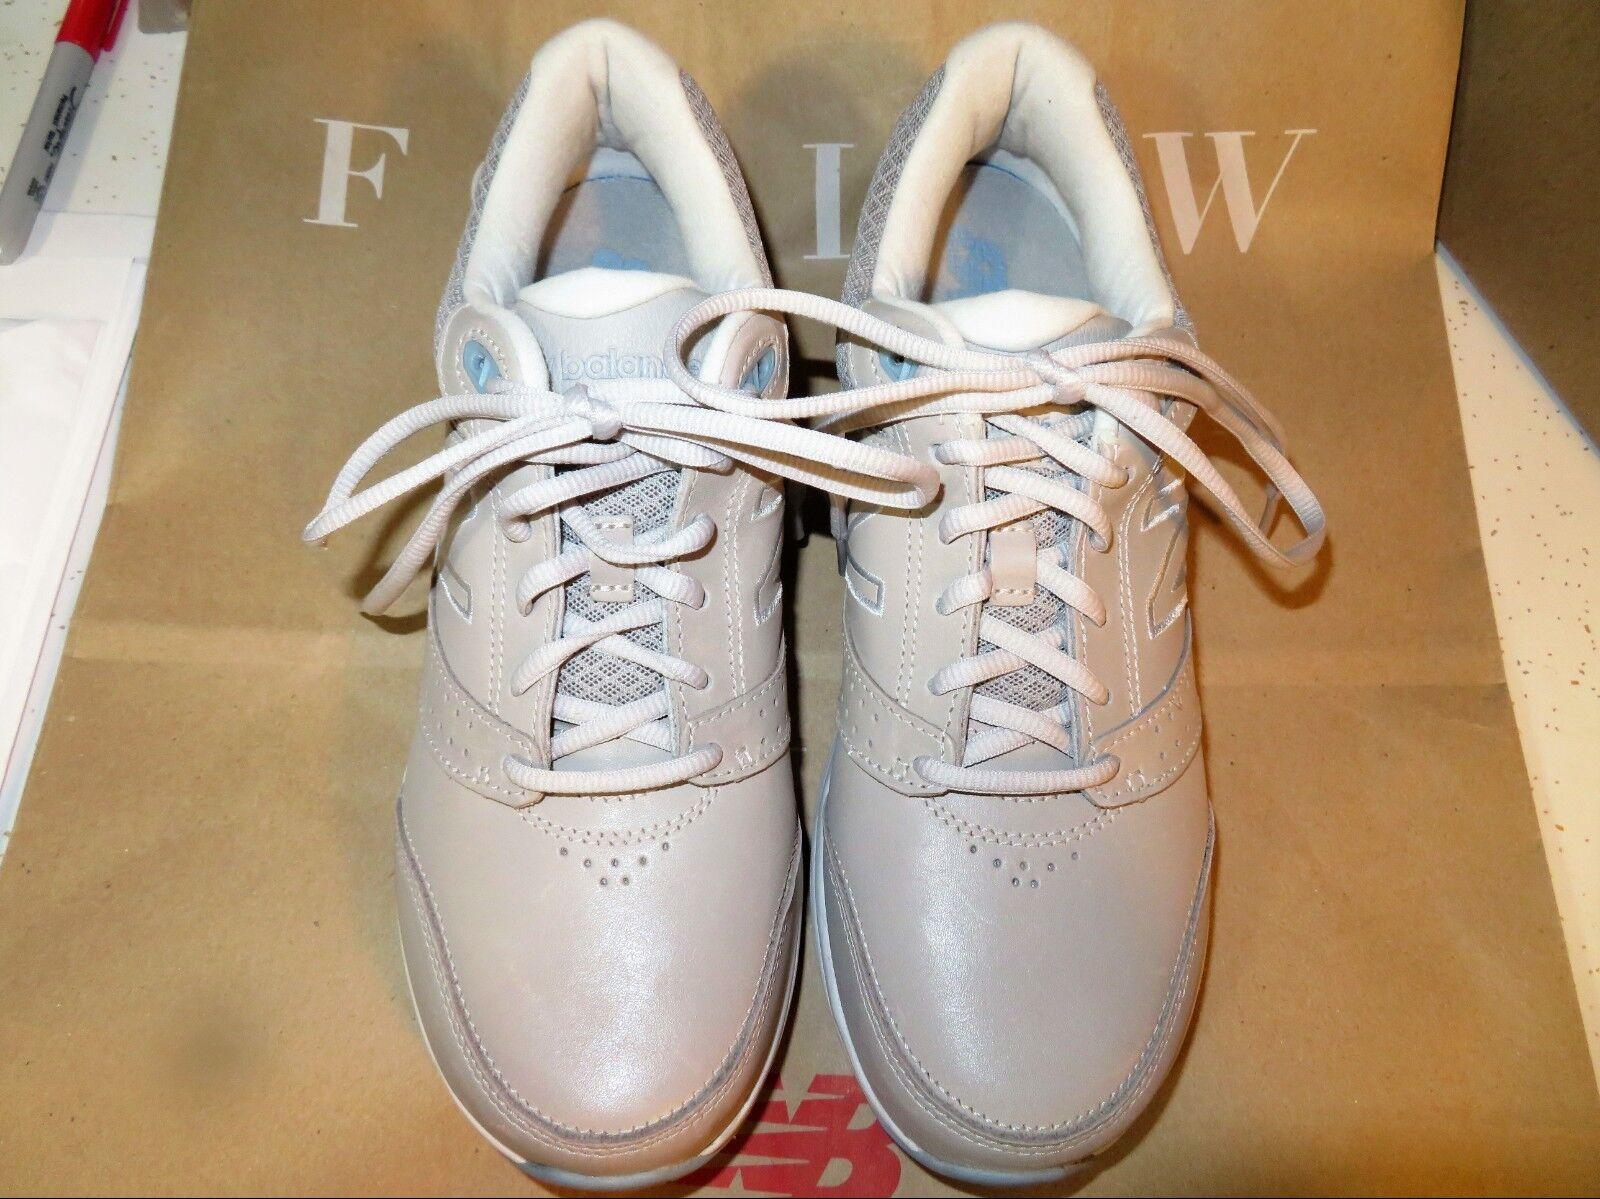 Womens New Balance shoes ww928gr2 Beige Beige Beige size 7.5 USA B Medium Width  NWB 0cad86